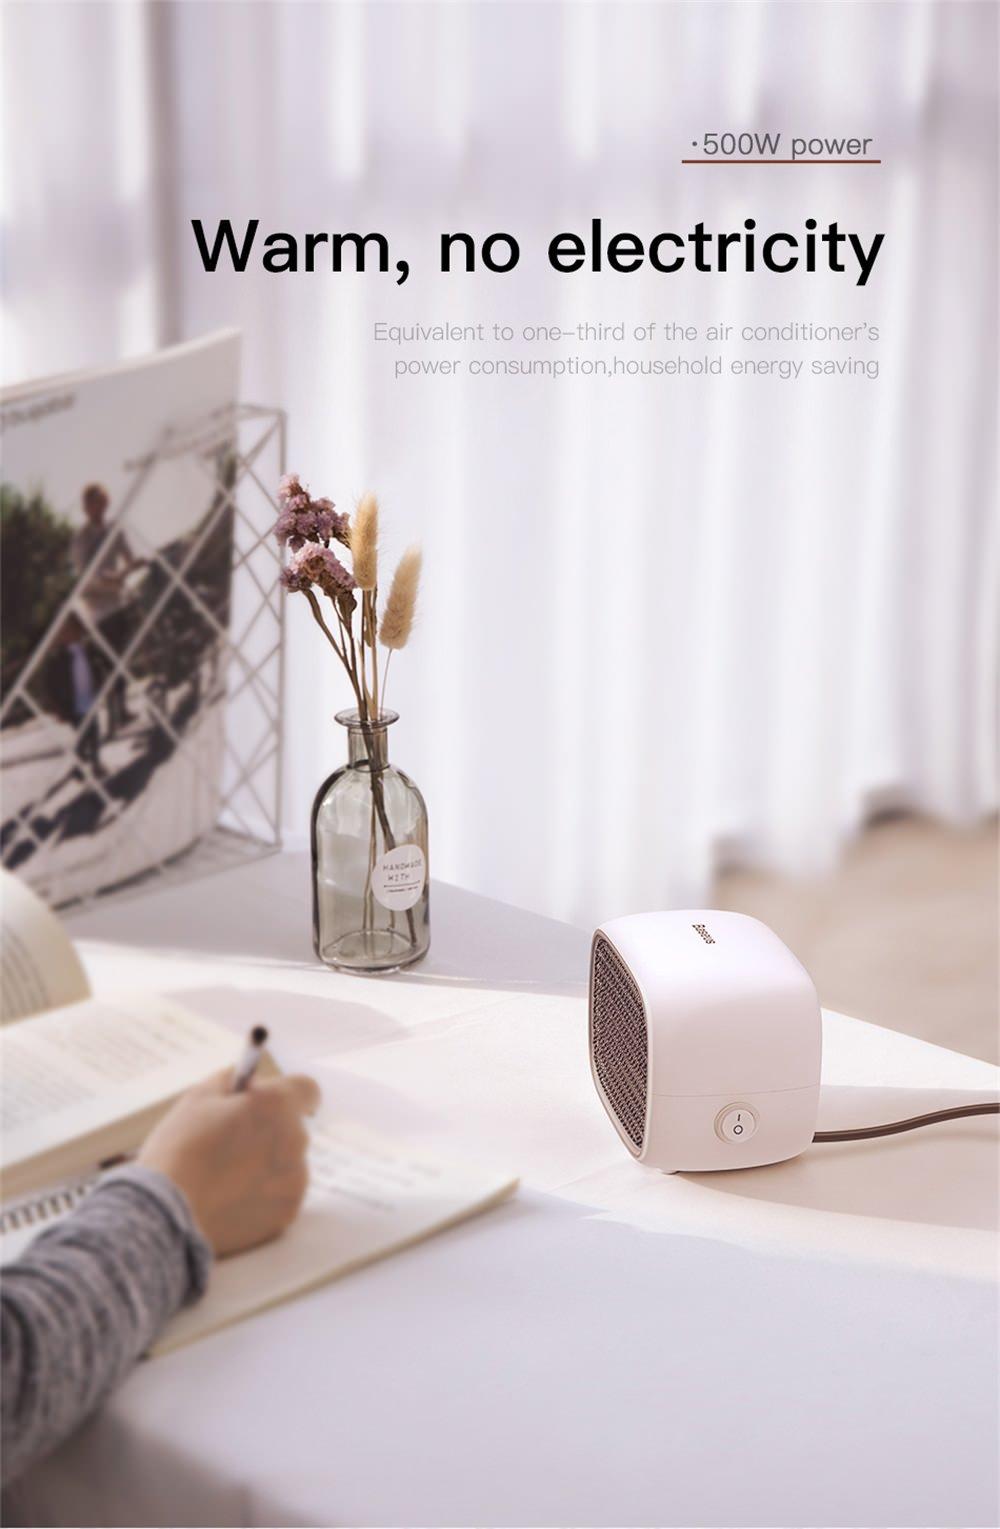 baseus electric mini fan heater